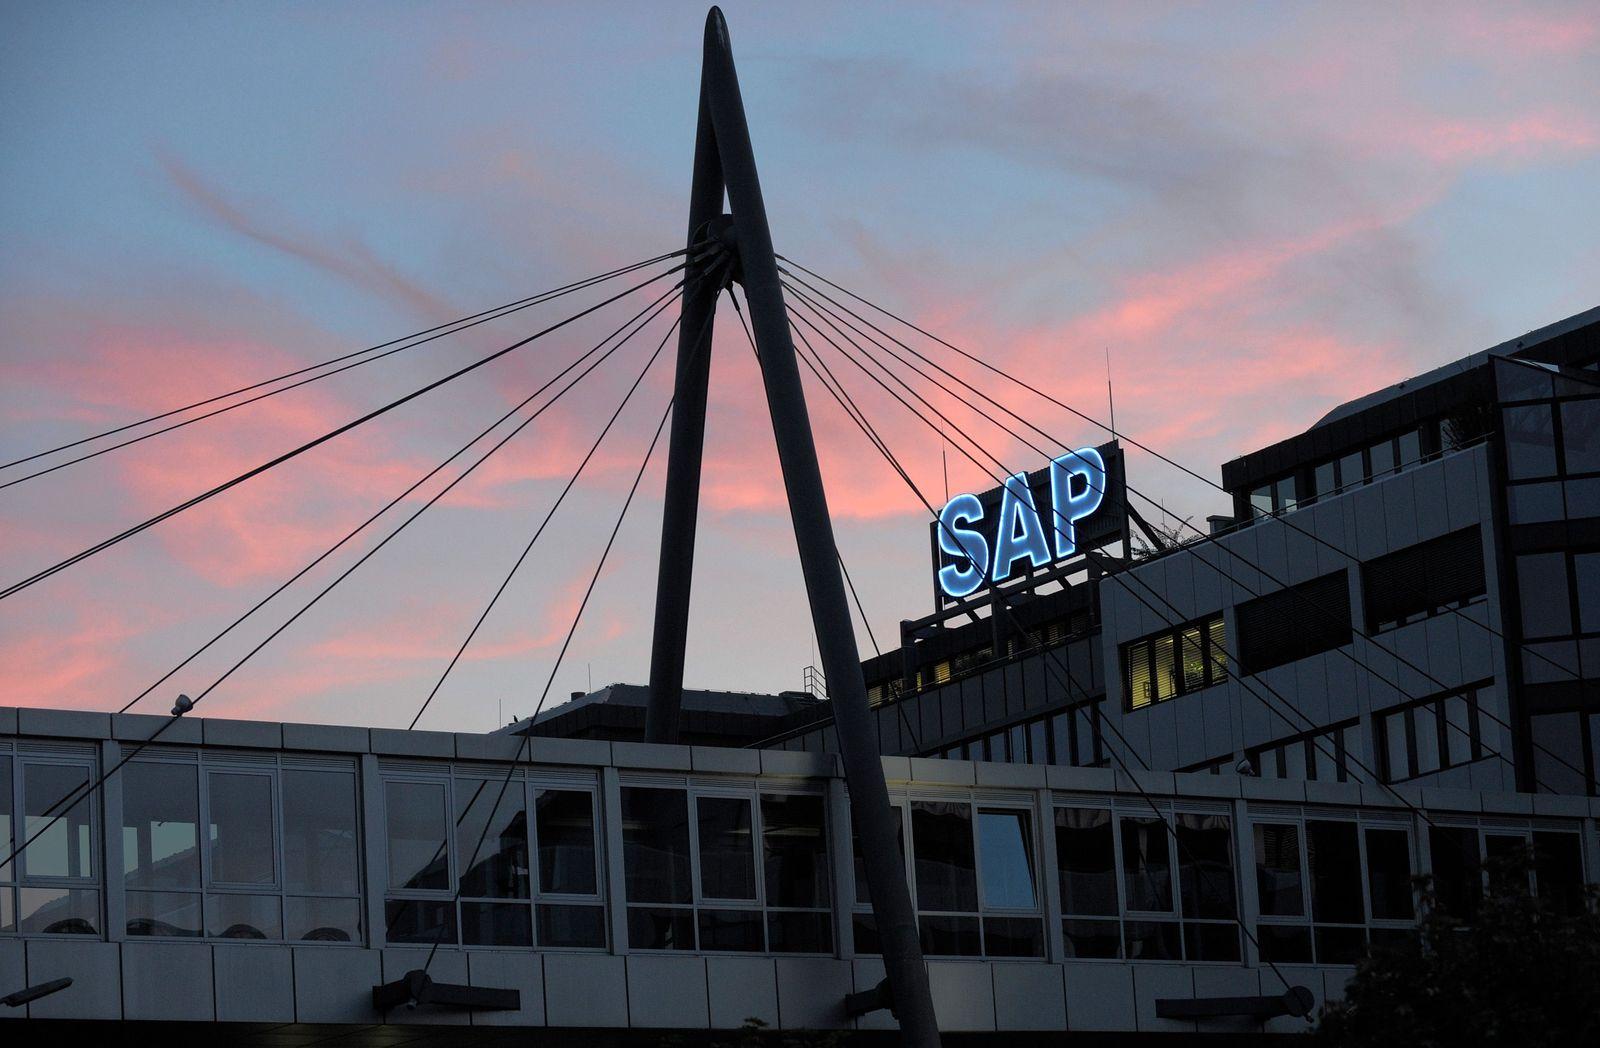 Thema mmo: SAP